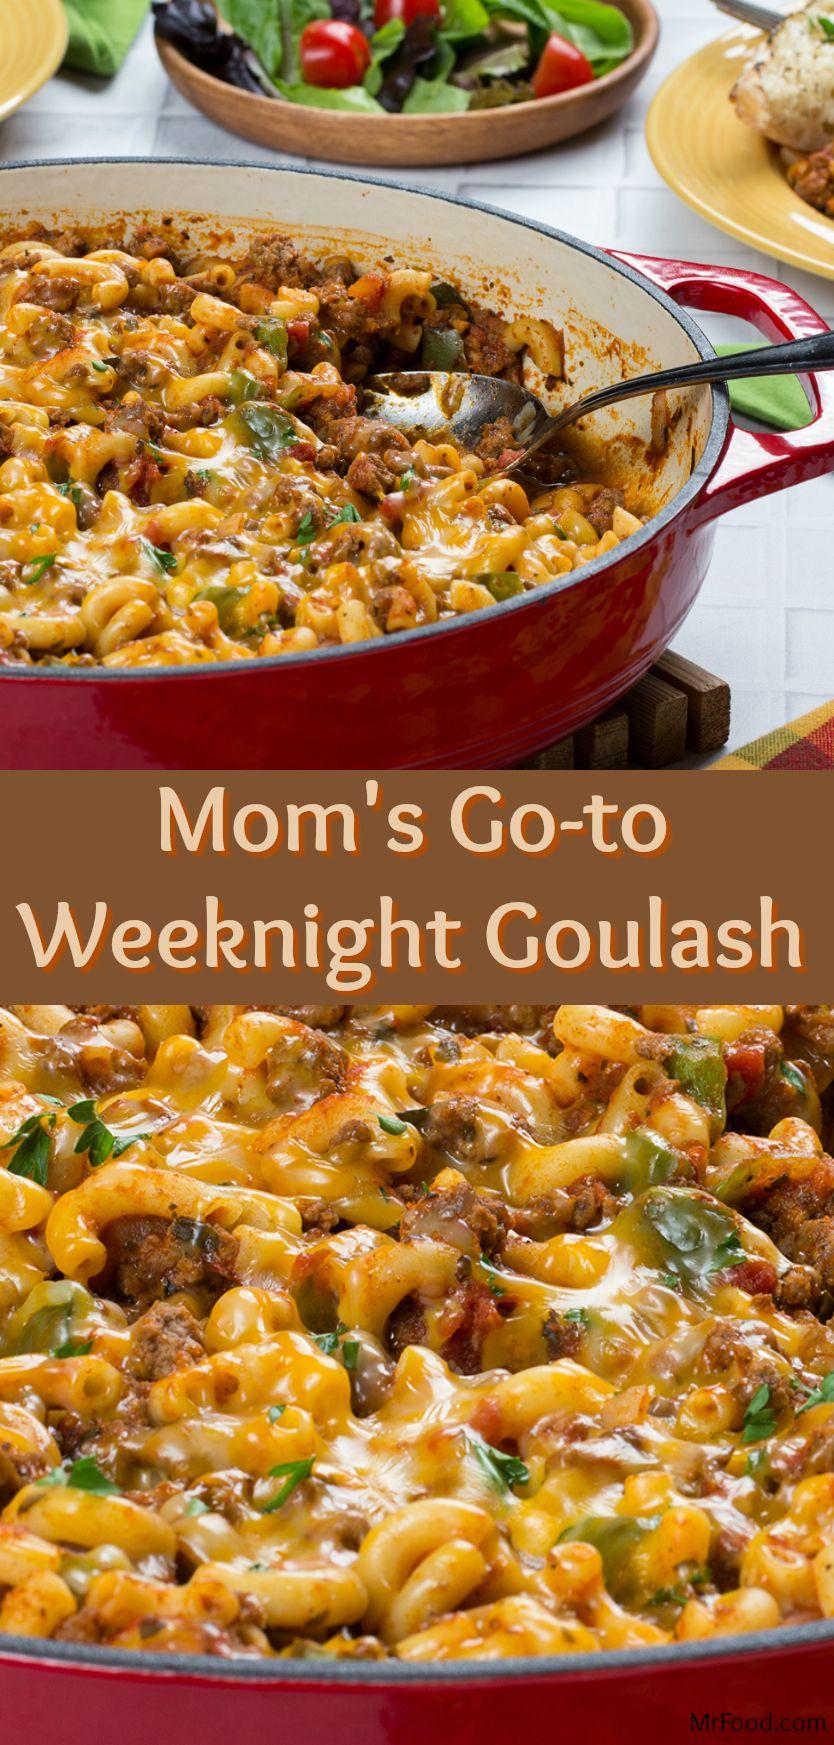 Mom S Go To Weeknight Goulash Recipe Weeknight Dinner Recipe Pasta Dishes Recipes